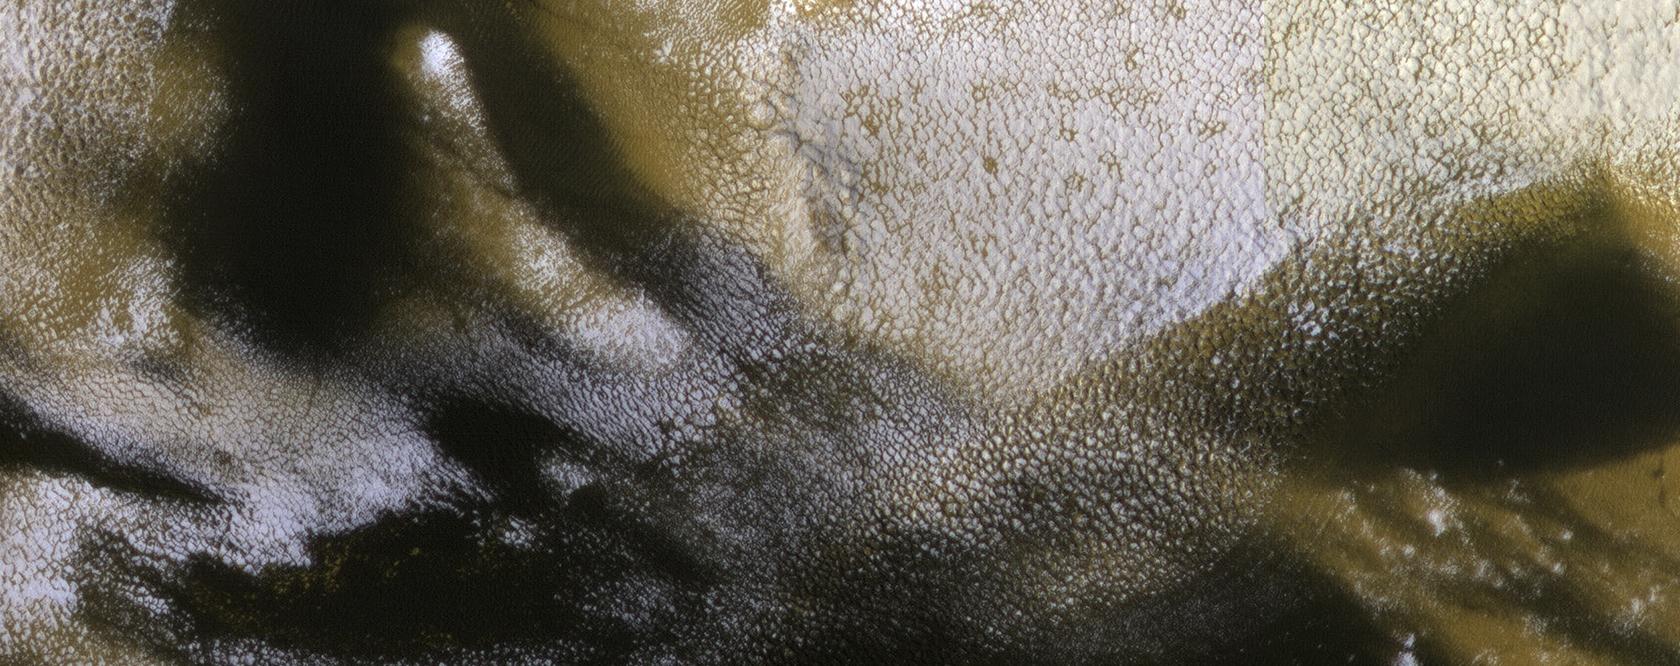 Dark Sand at the Margin